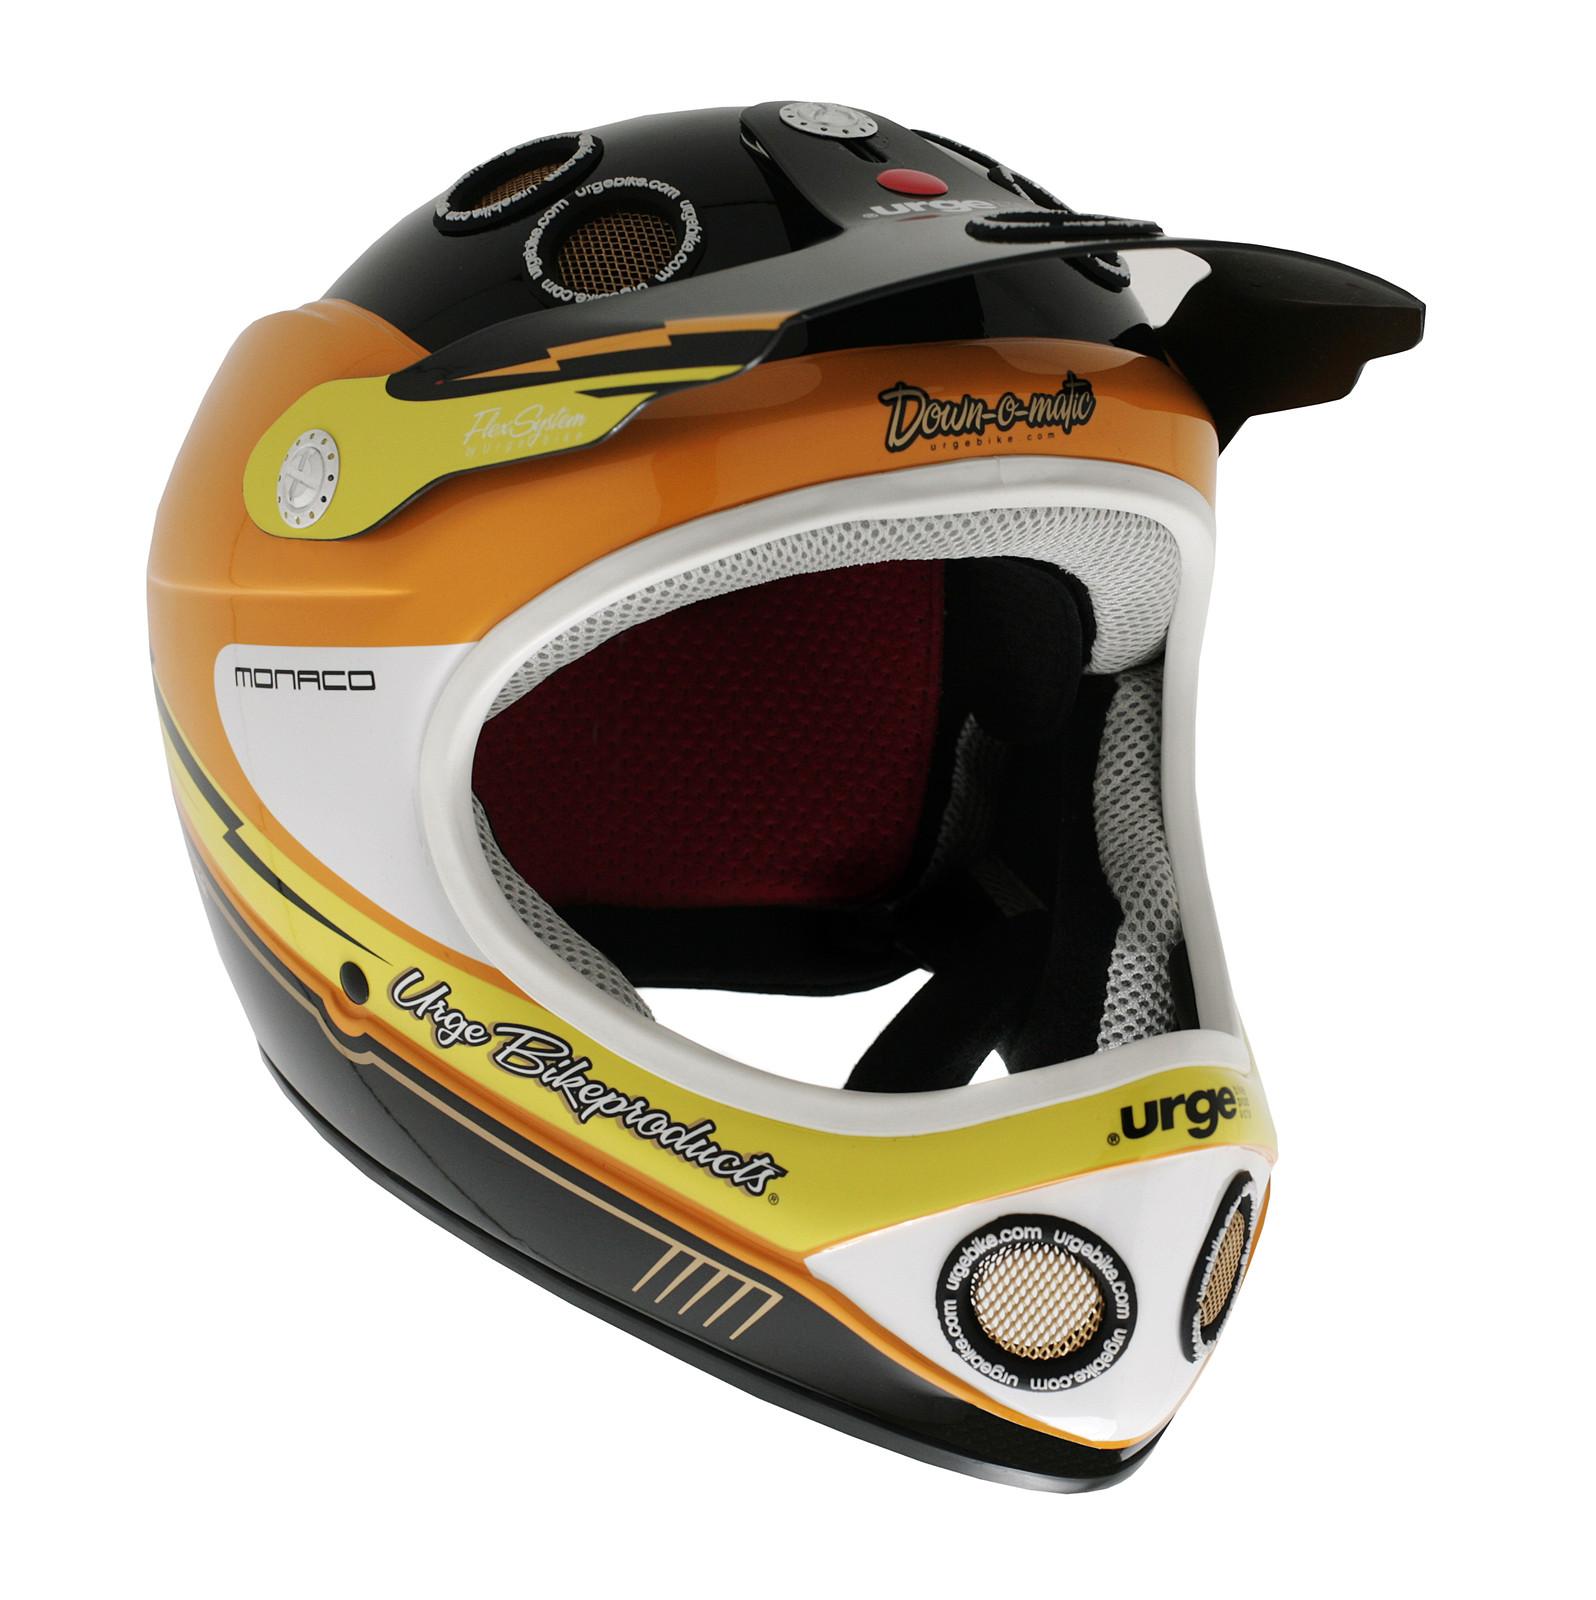 Urge Down-O-Matic Monaco Full Face Helmet _MG_0032